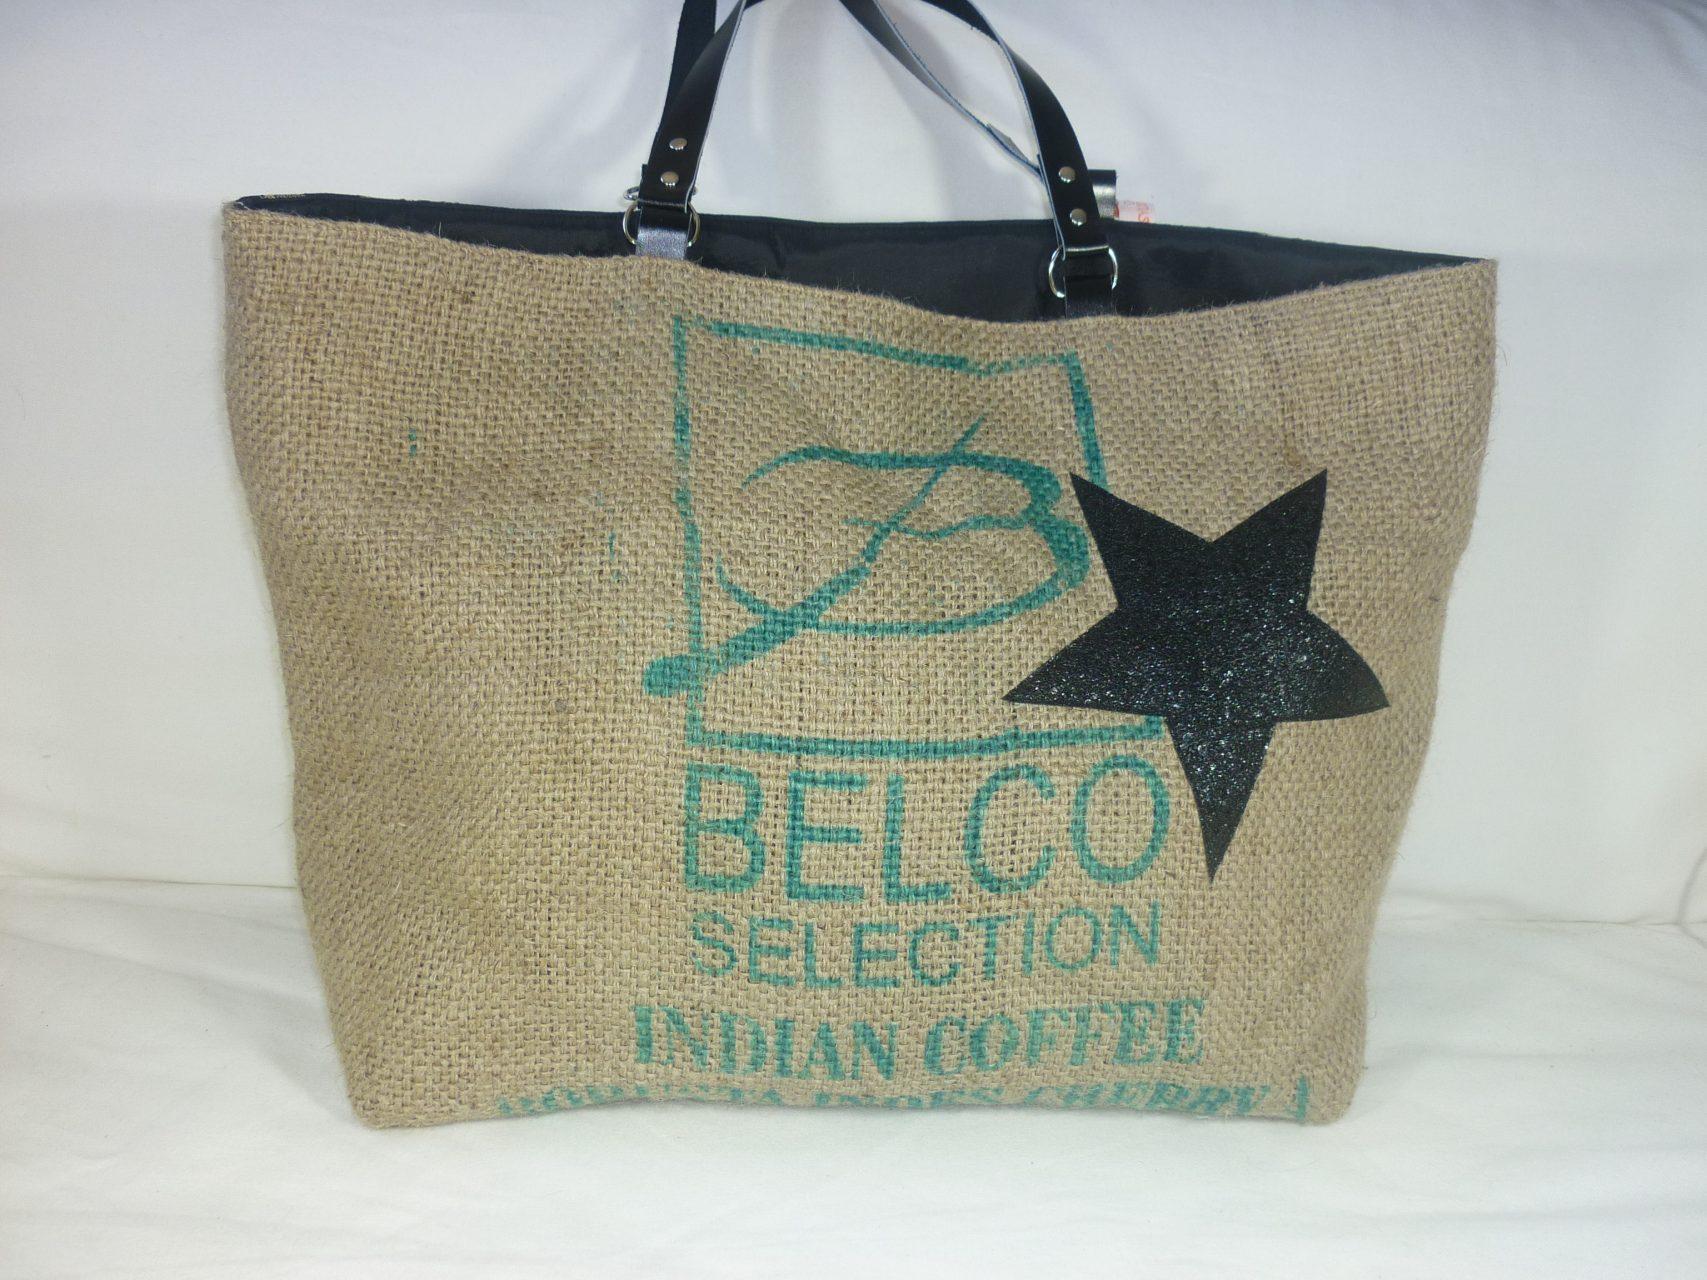 sac cabas r versible en jute recycl e ancien sac de caf. Black Bedroom Furniture Sets. Home Design Ideas